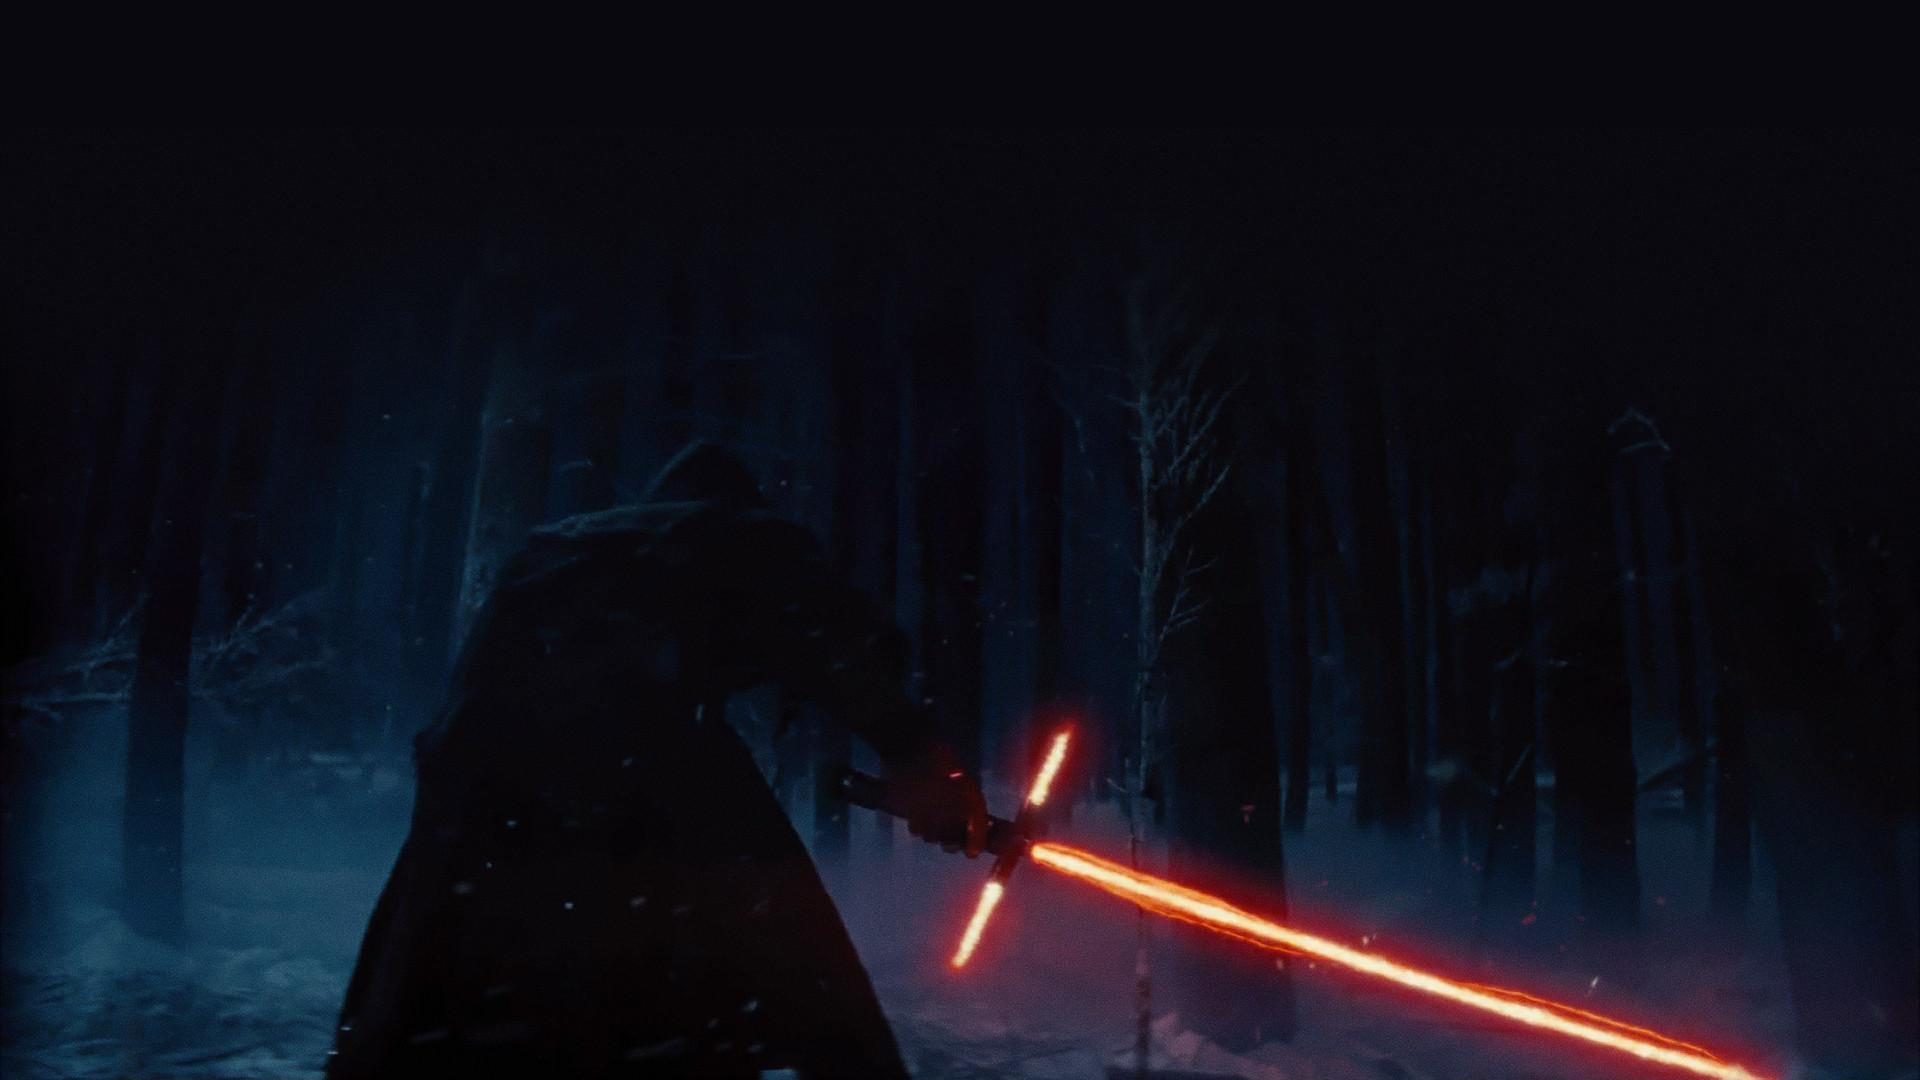 star wars dark side wallpaper 70 images